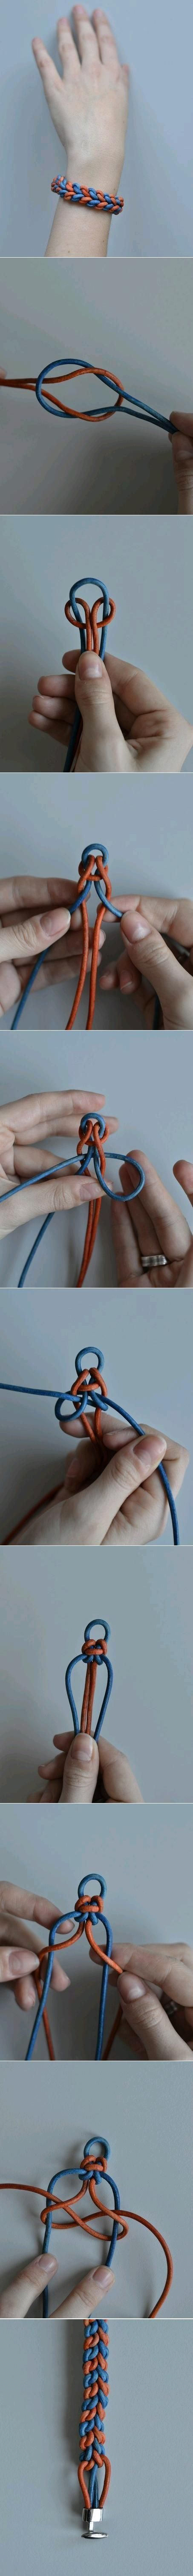 1***vs***Bracelet DIY Handmade